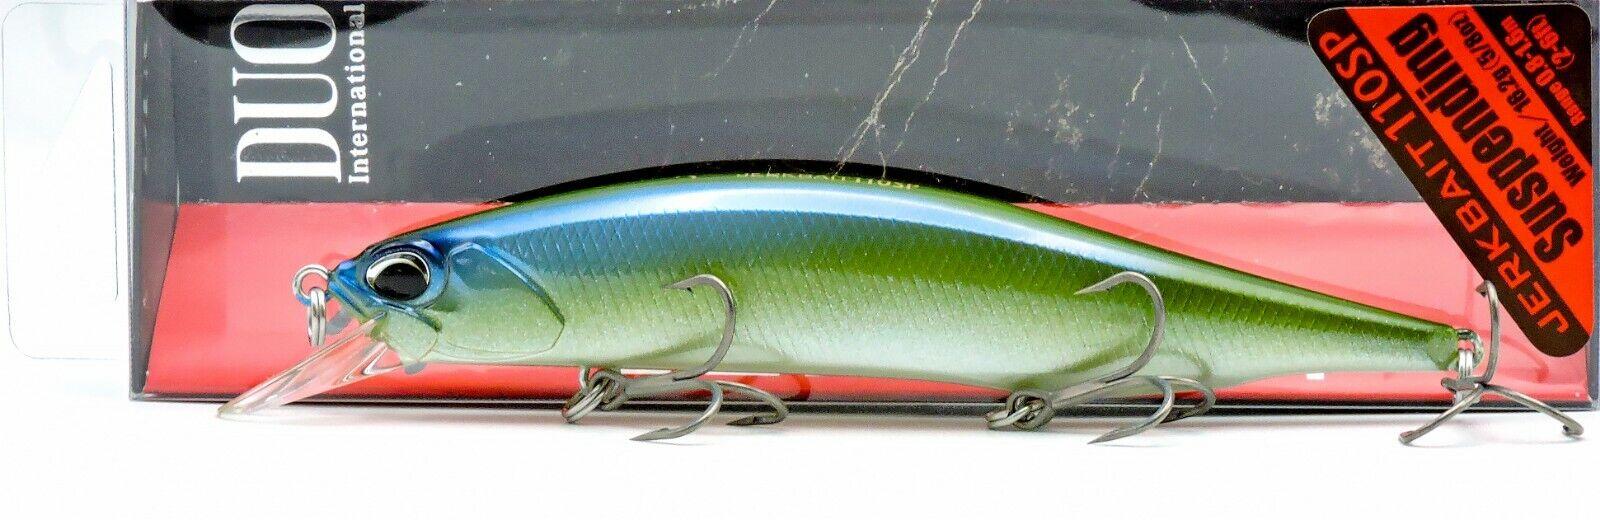 DUO Realis Jerkbait 110SP A Mart Shimmer 110mm Suspending Jerkbait Bass 110